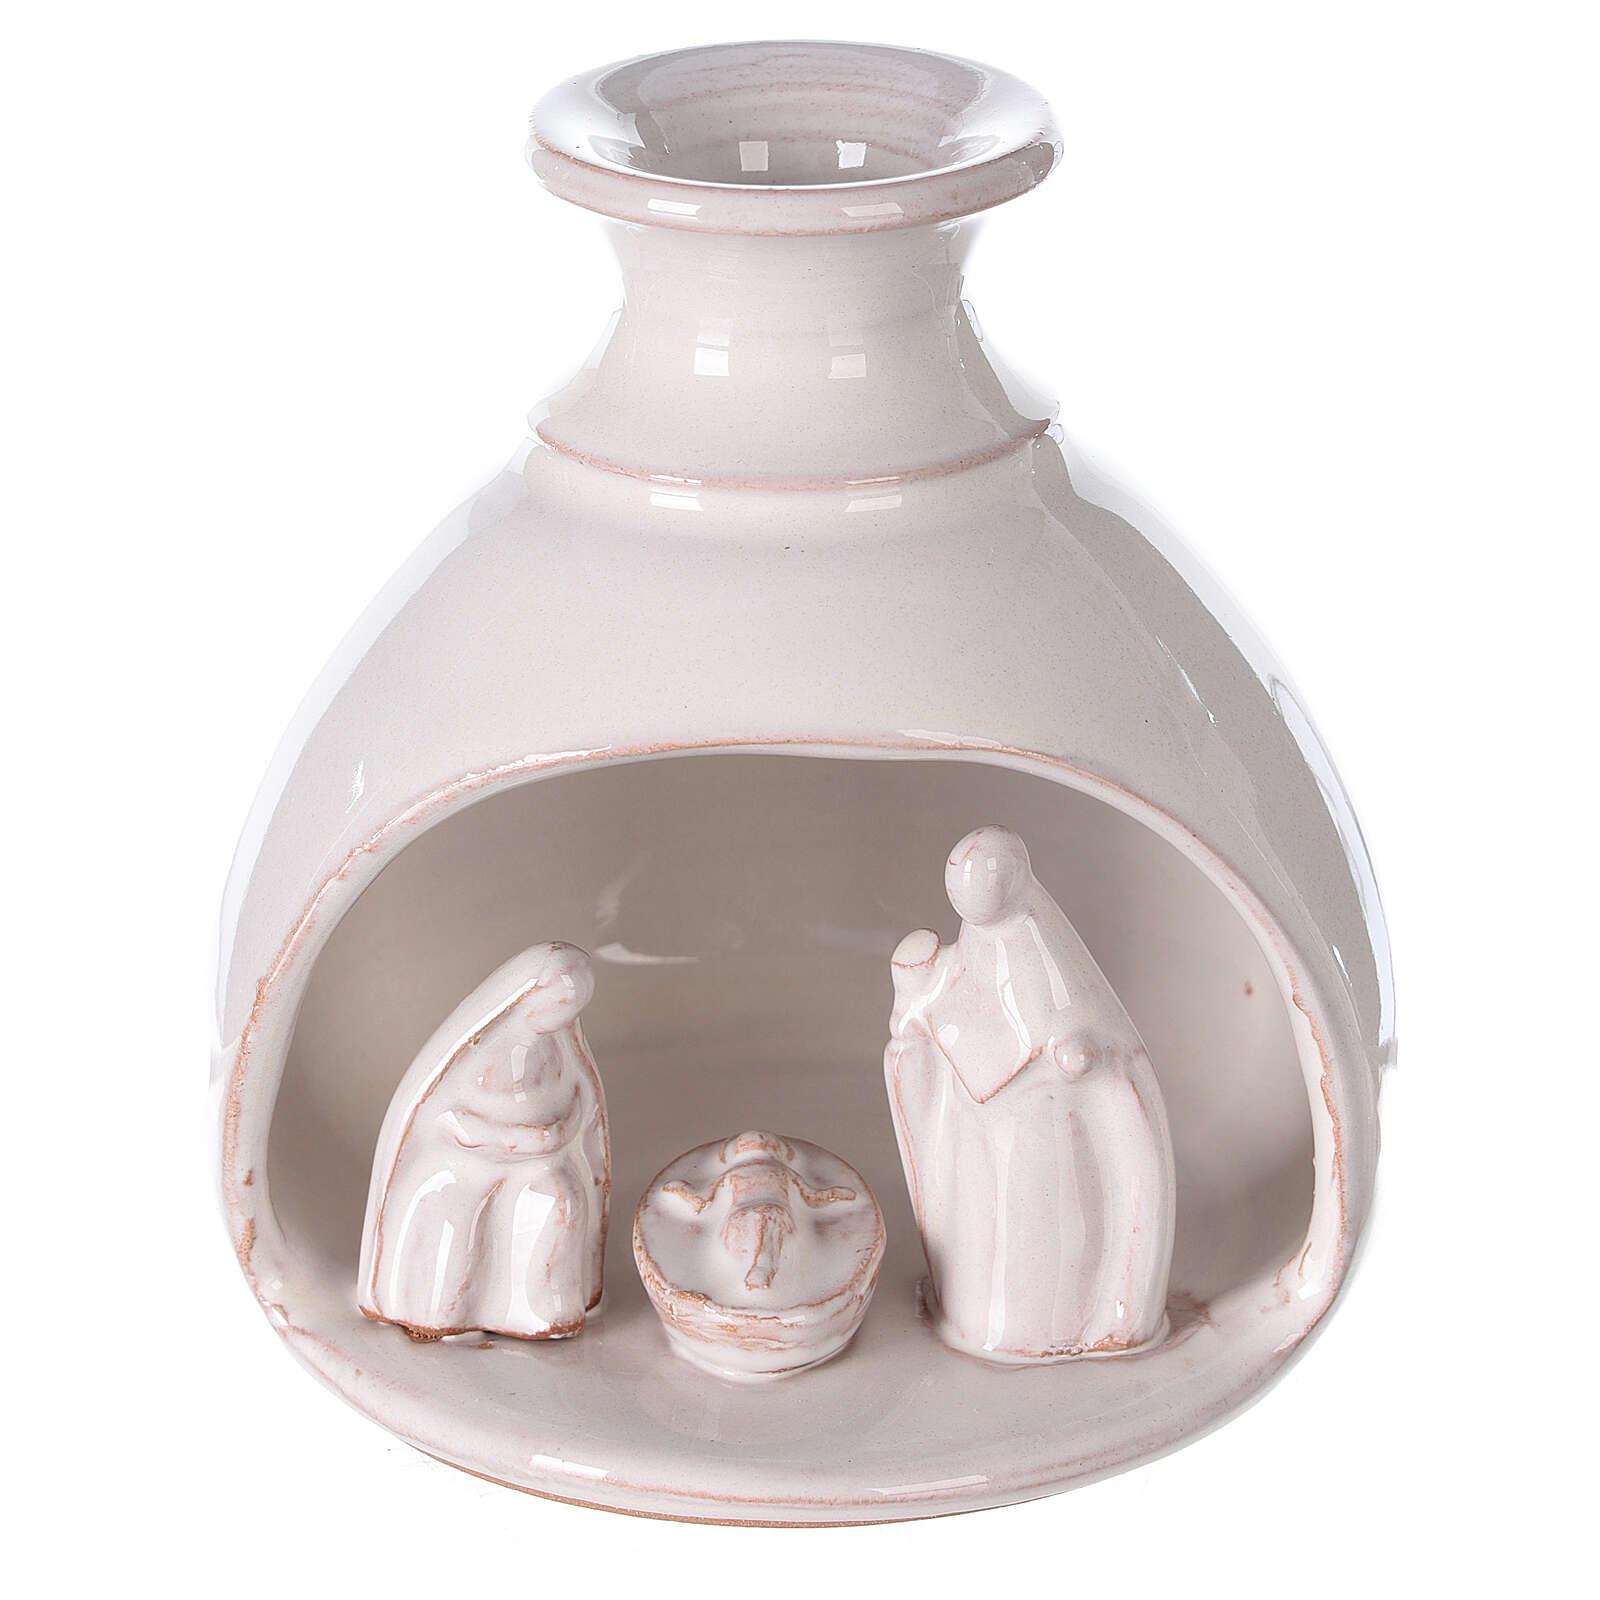 Miniature Nativity set in vase white Deruta terracotta 10 cm 4